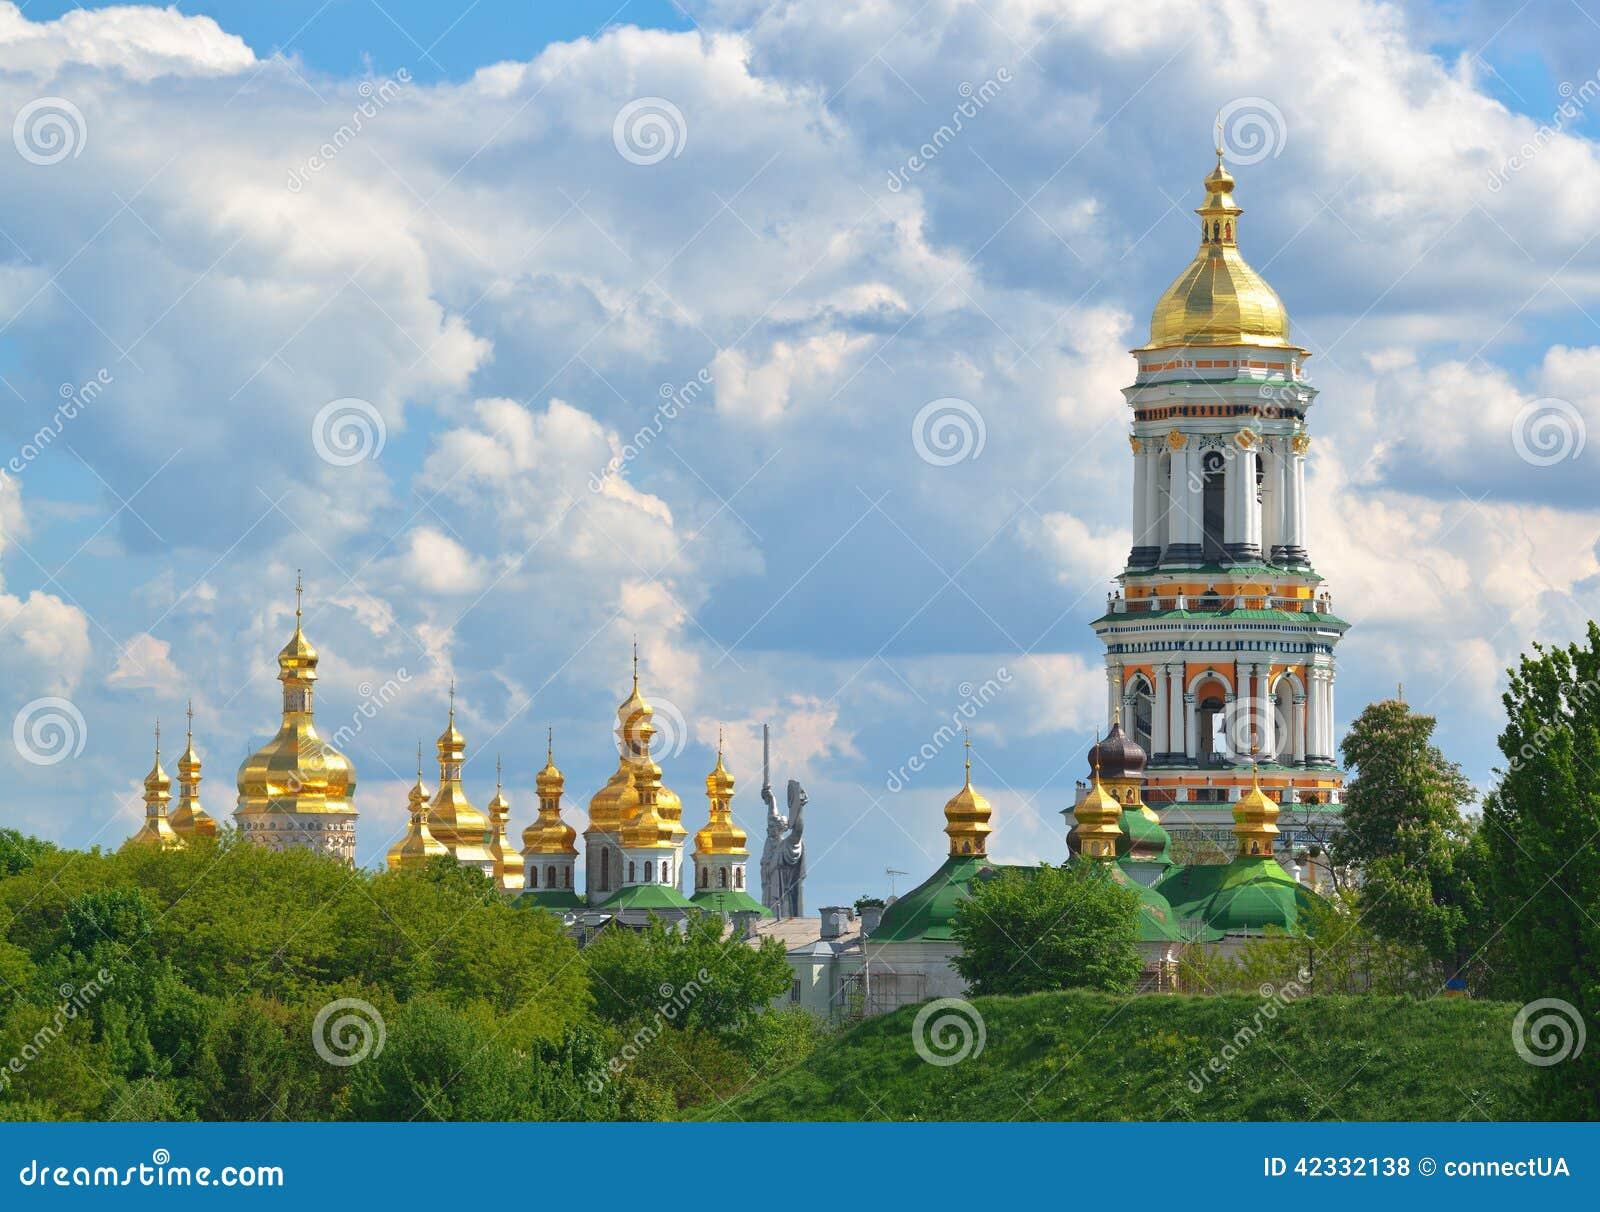 Kiev lavra pechersk